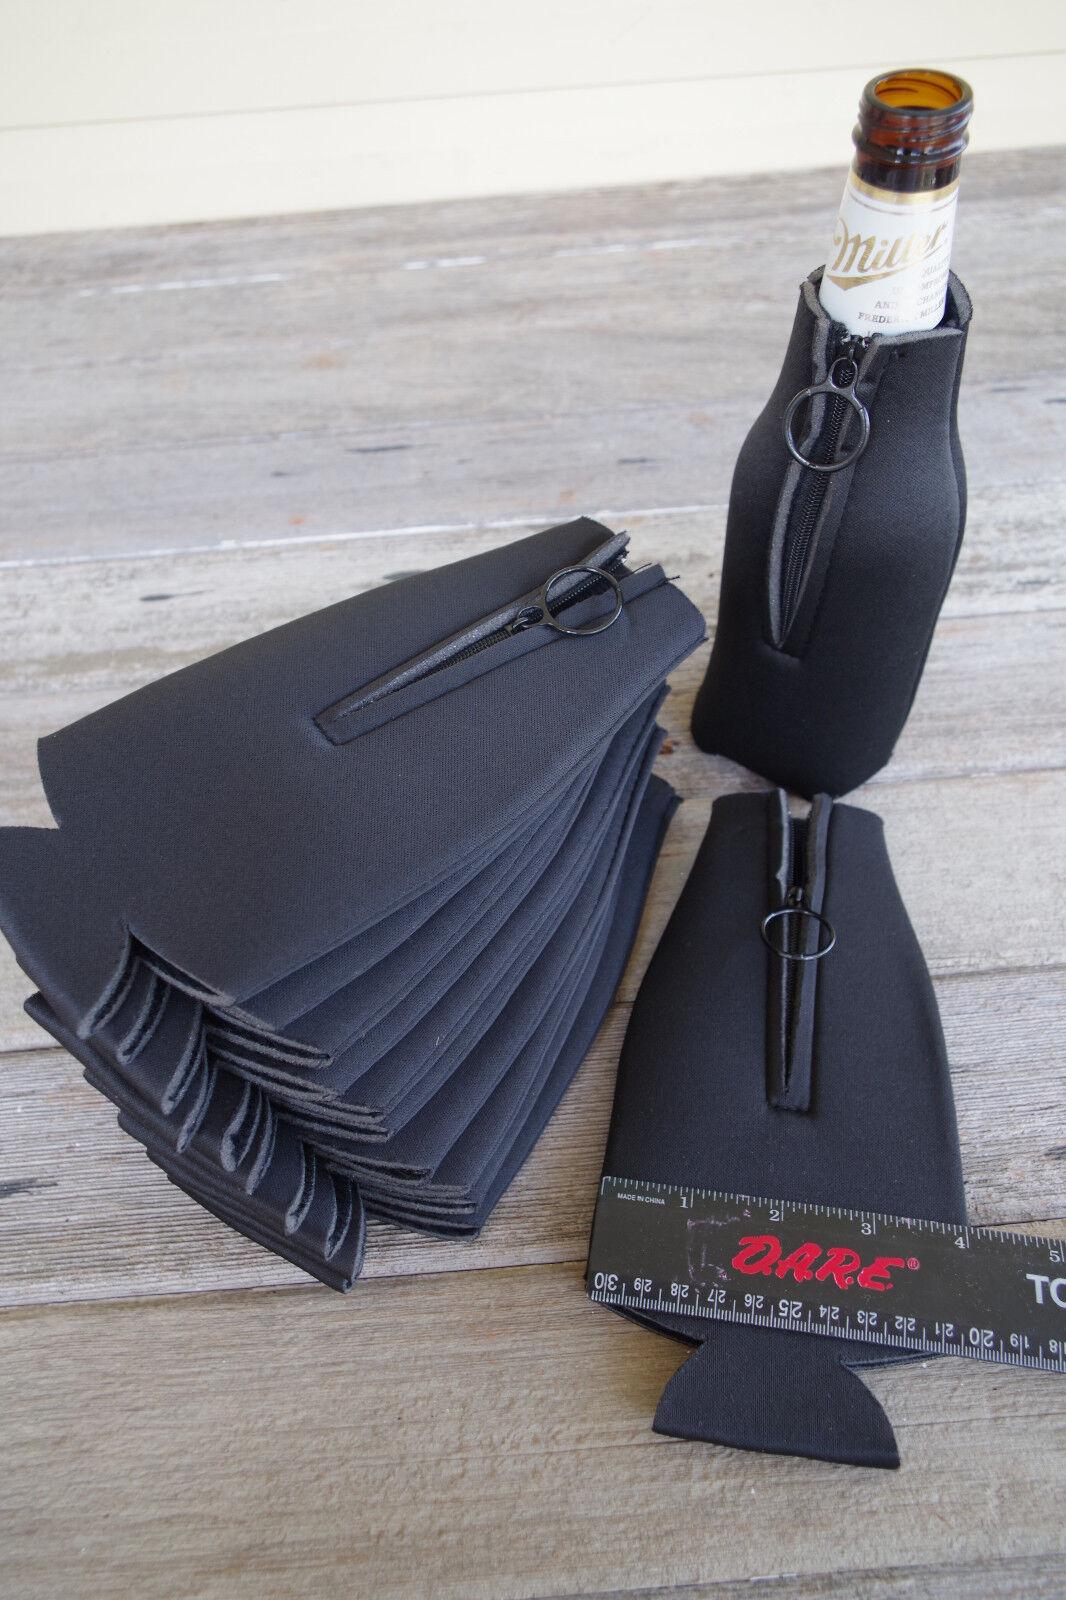 Blank Foam Can /& Bottle Coolers Zipper Beer Bottle Coolies Koozies 5 Pack #7